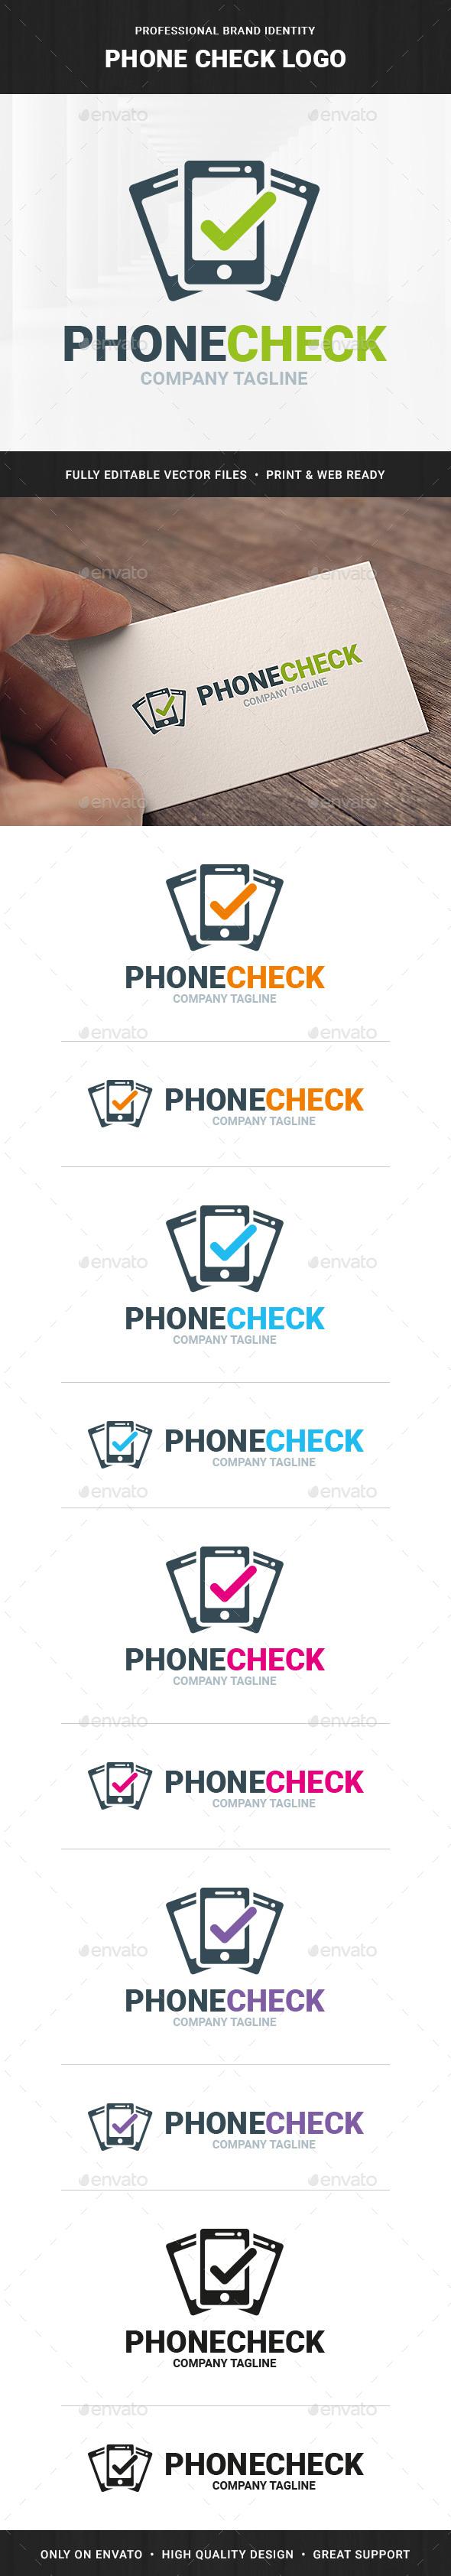 Phone Check Logo Template